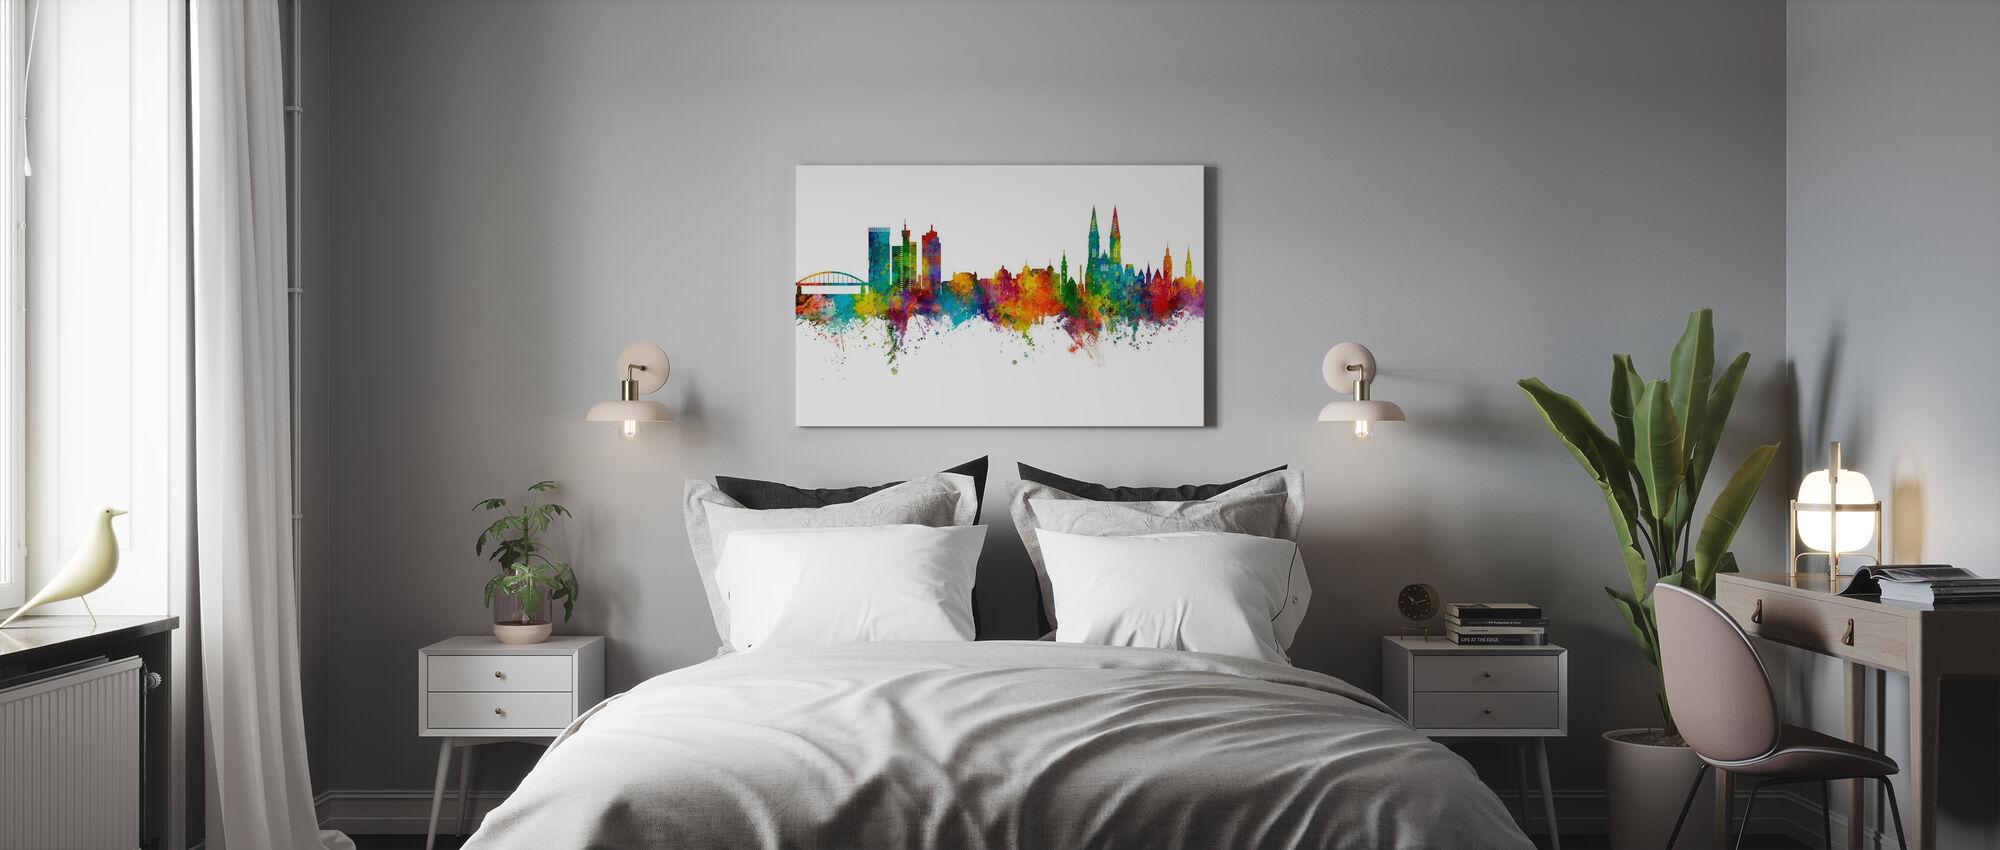 Zagreb Croatia Skyline - Canvas print - Bedroom